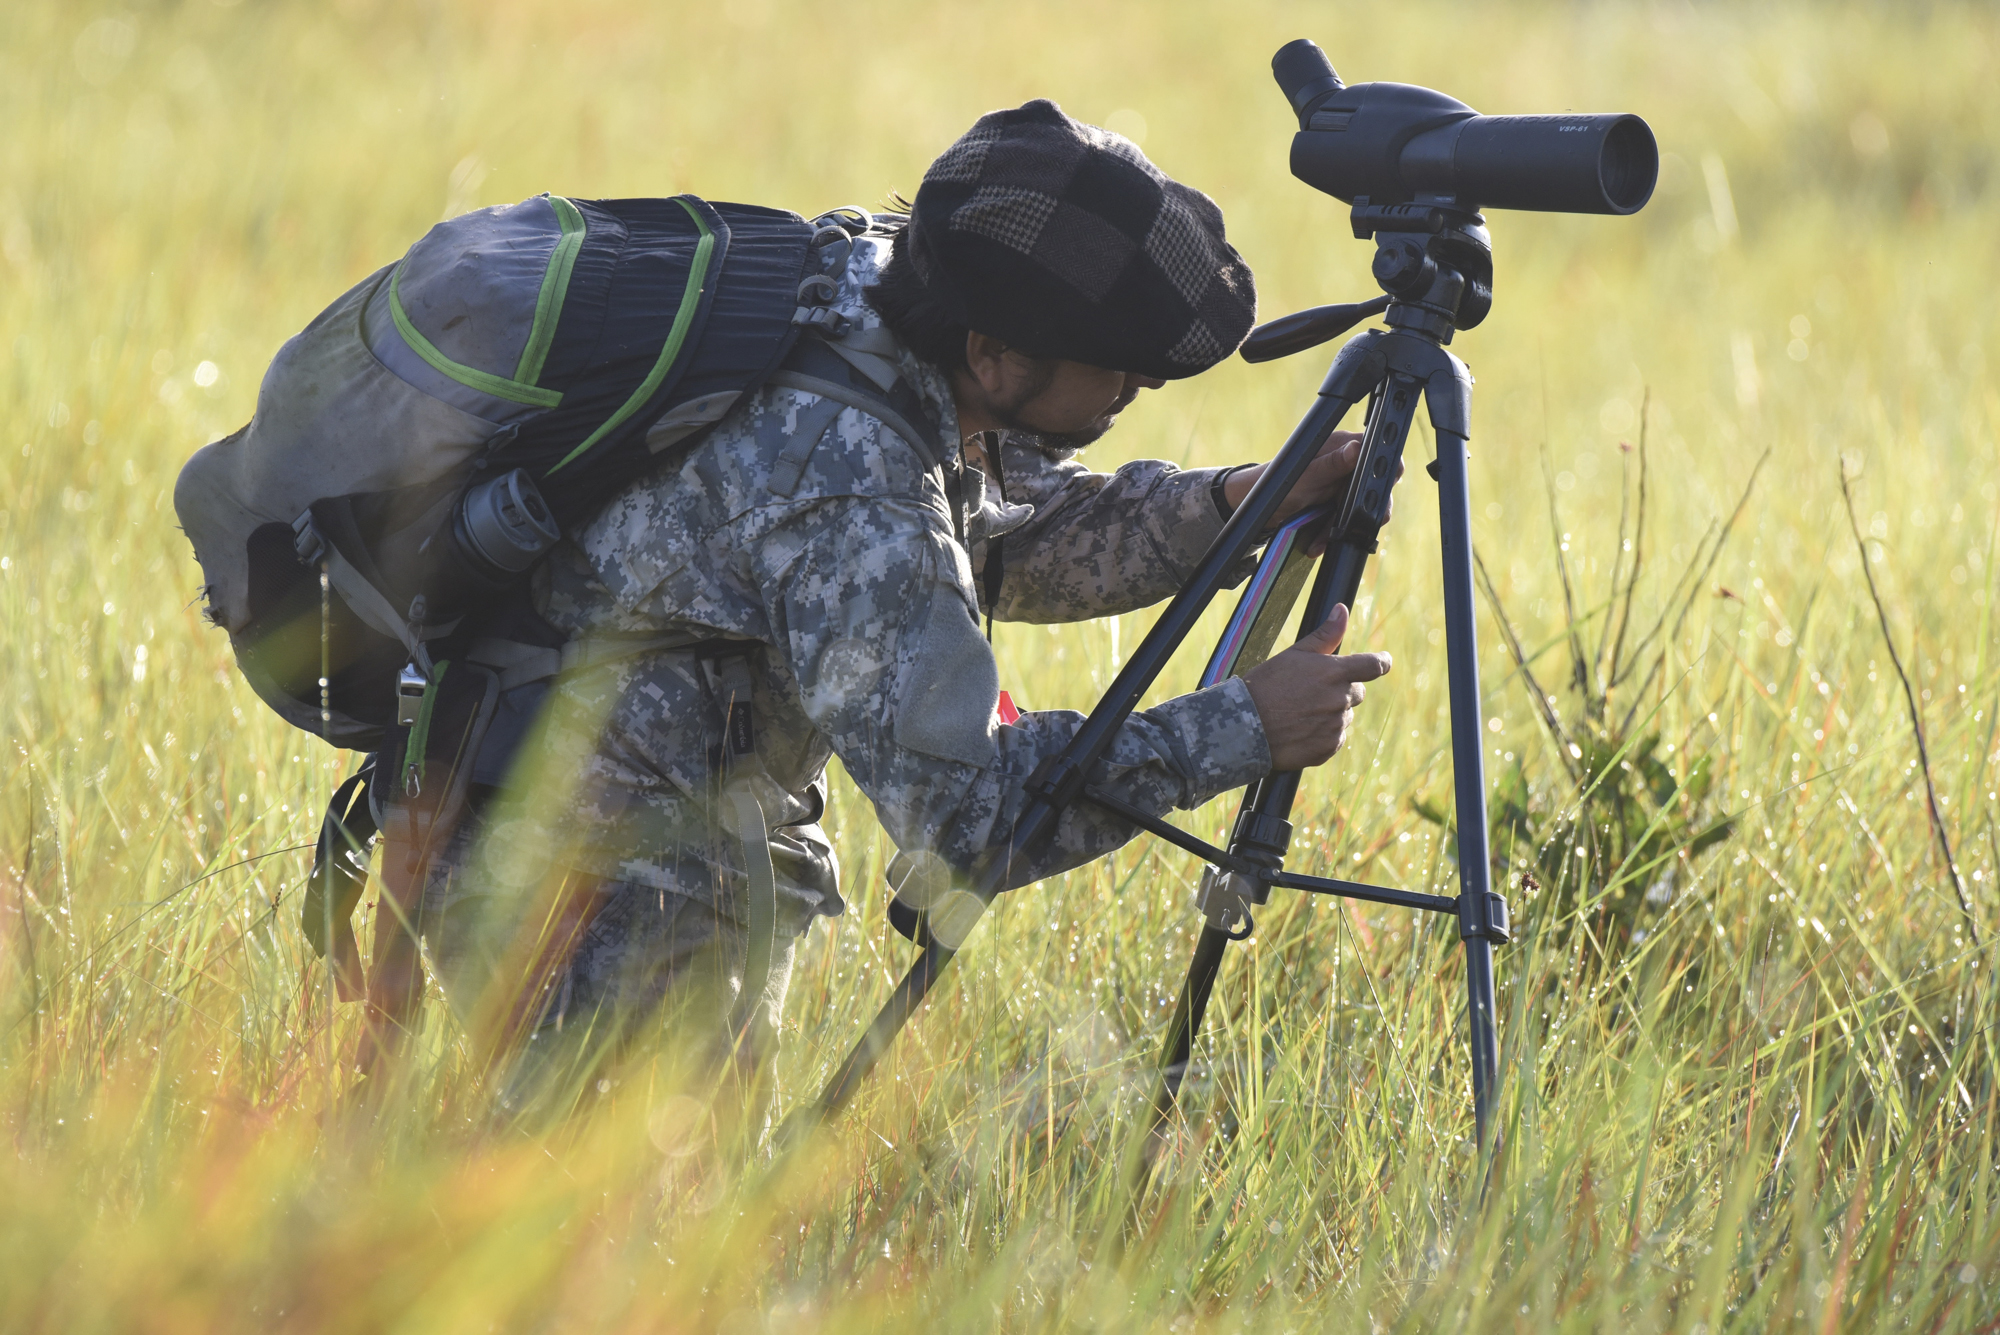 Yohamir adjusts his scope's tripod.